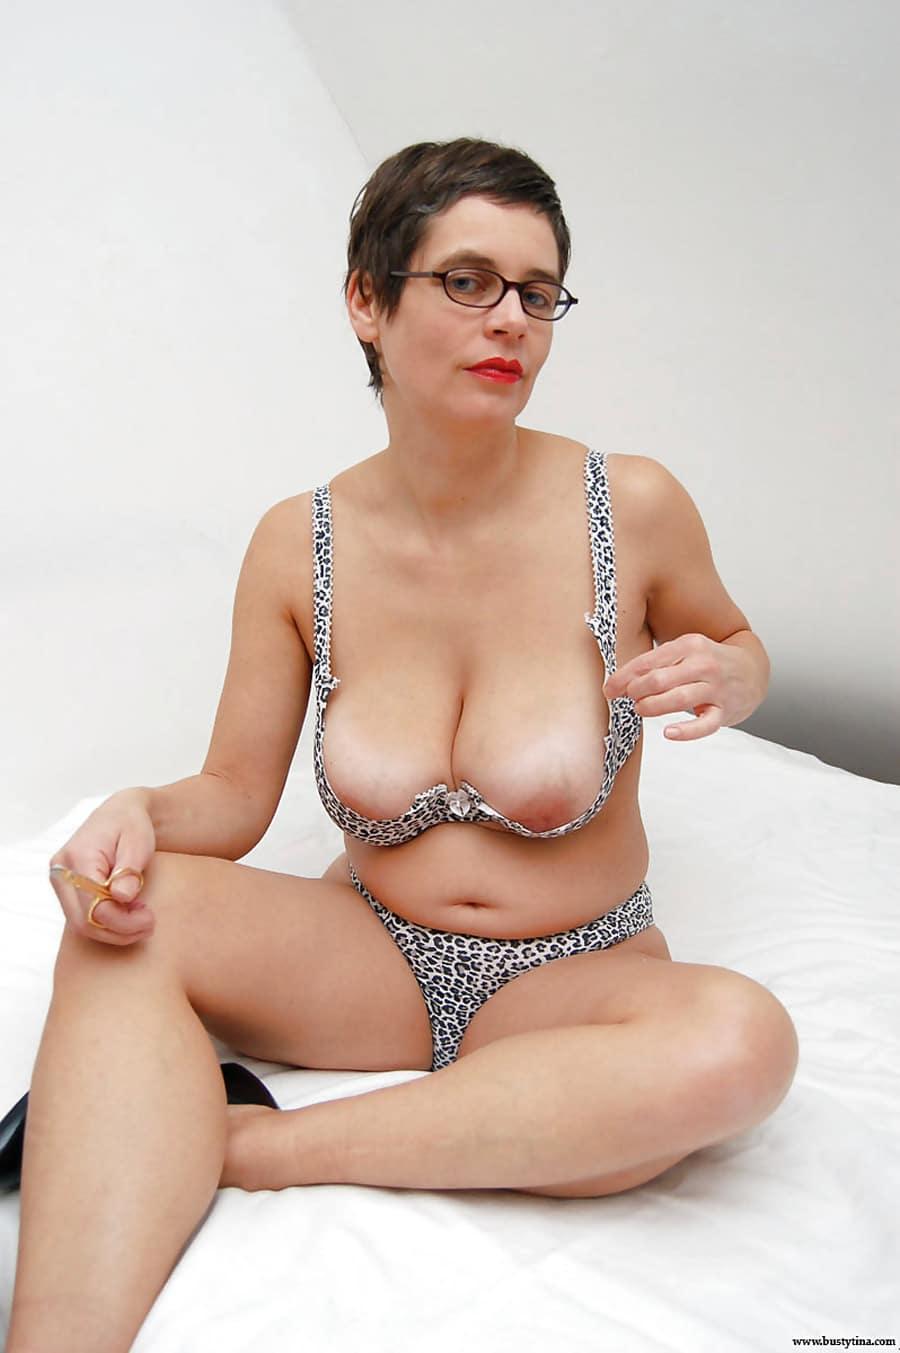 femme a lunette salope mature salop